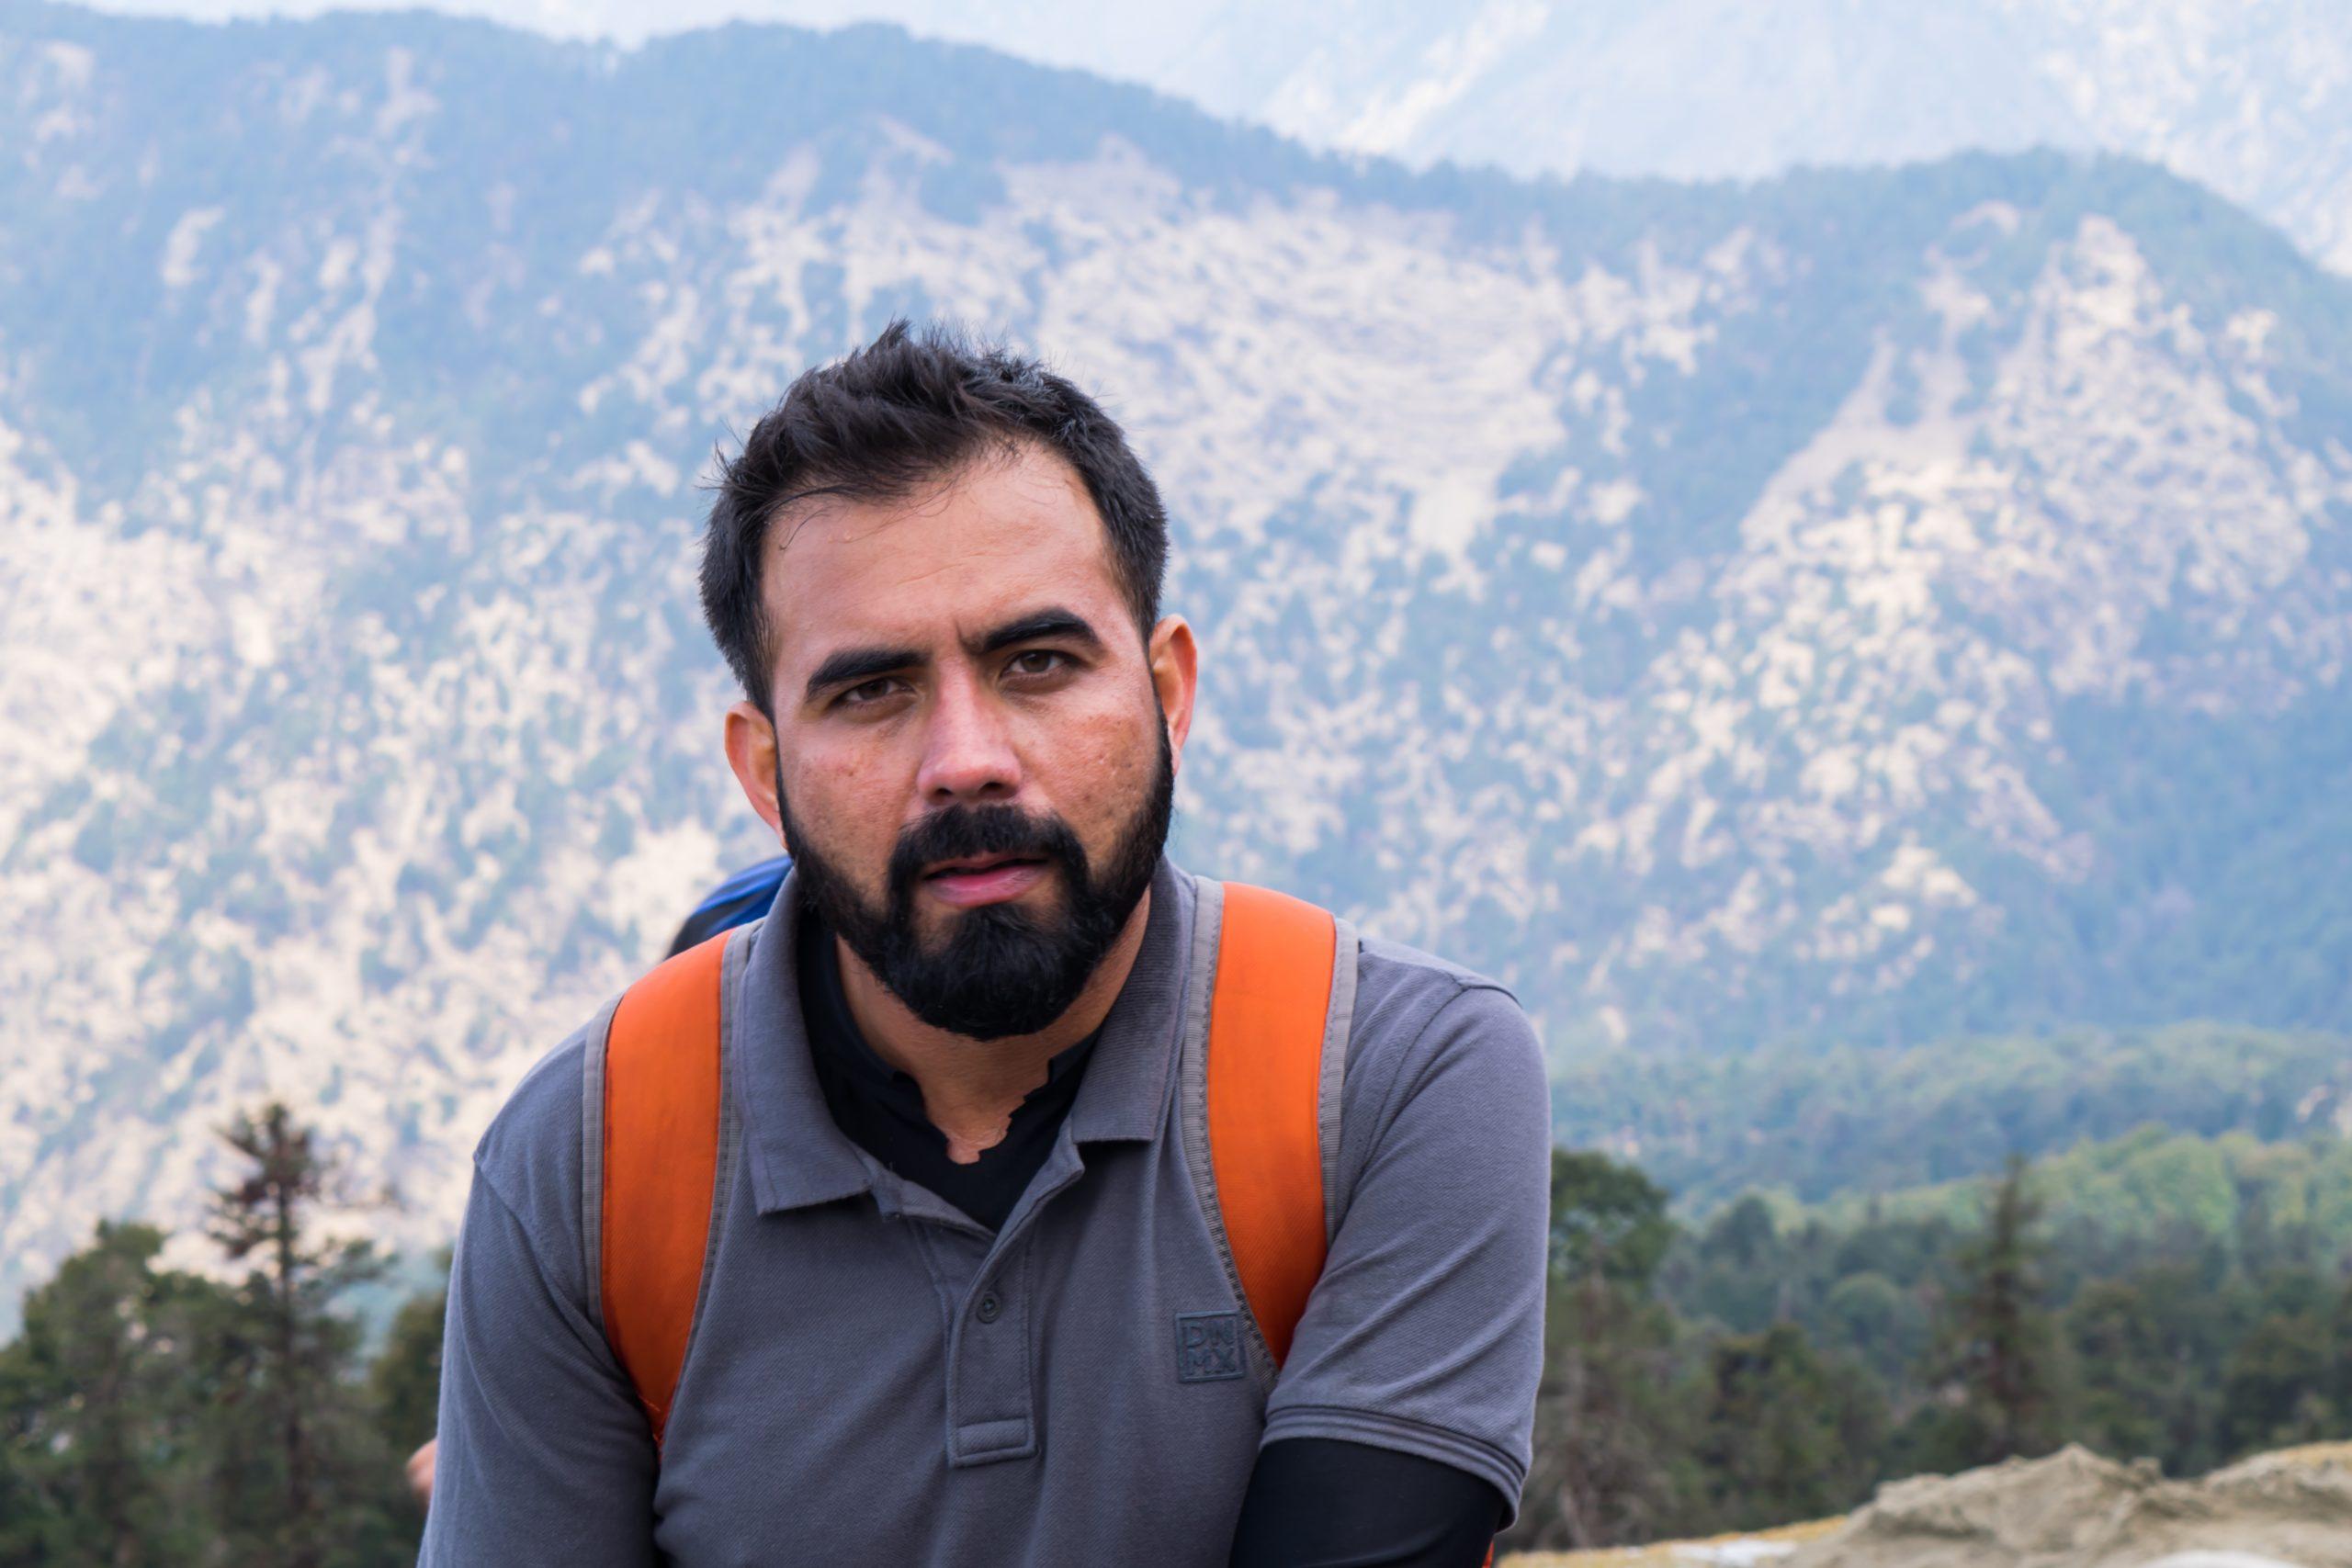 A man trekking in the hills